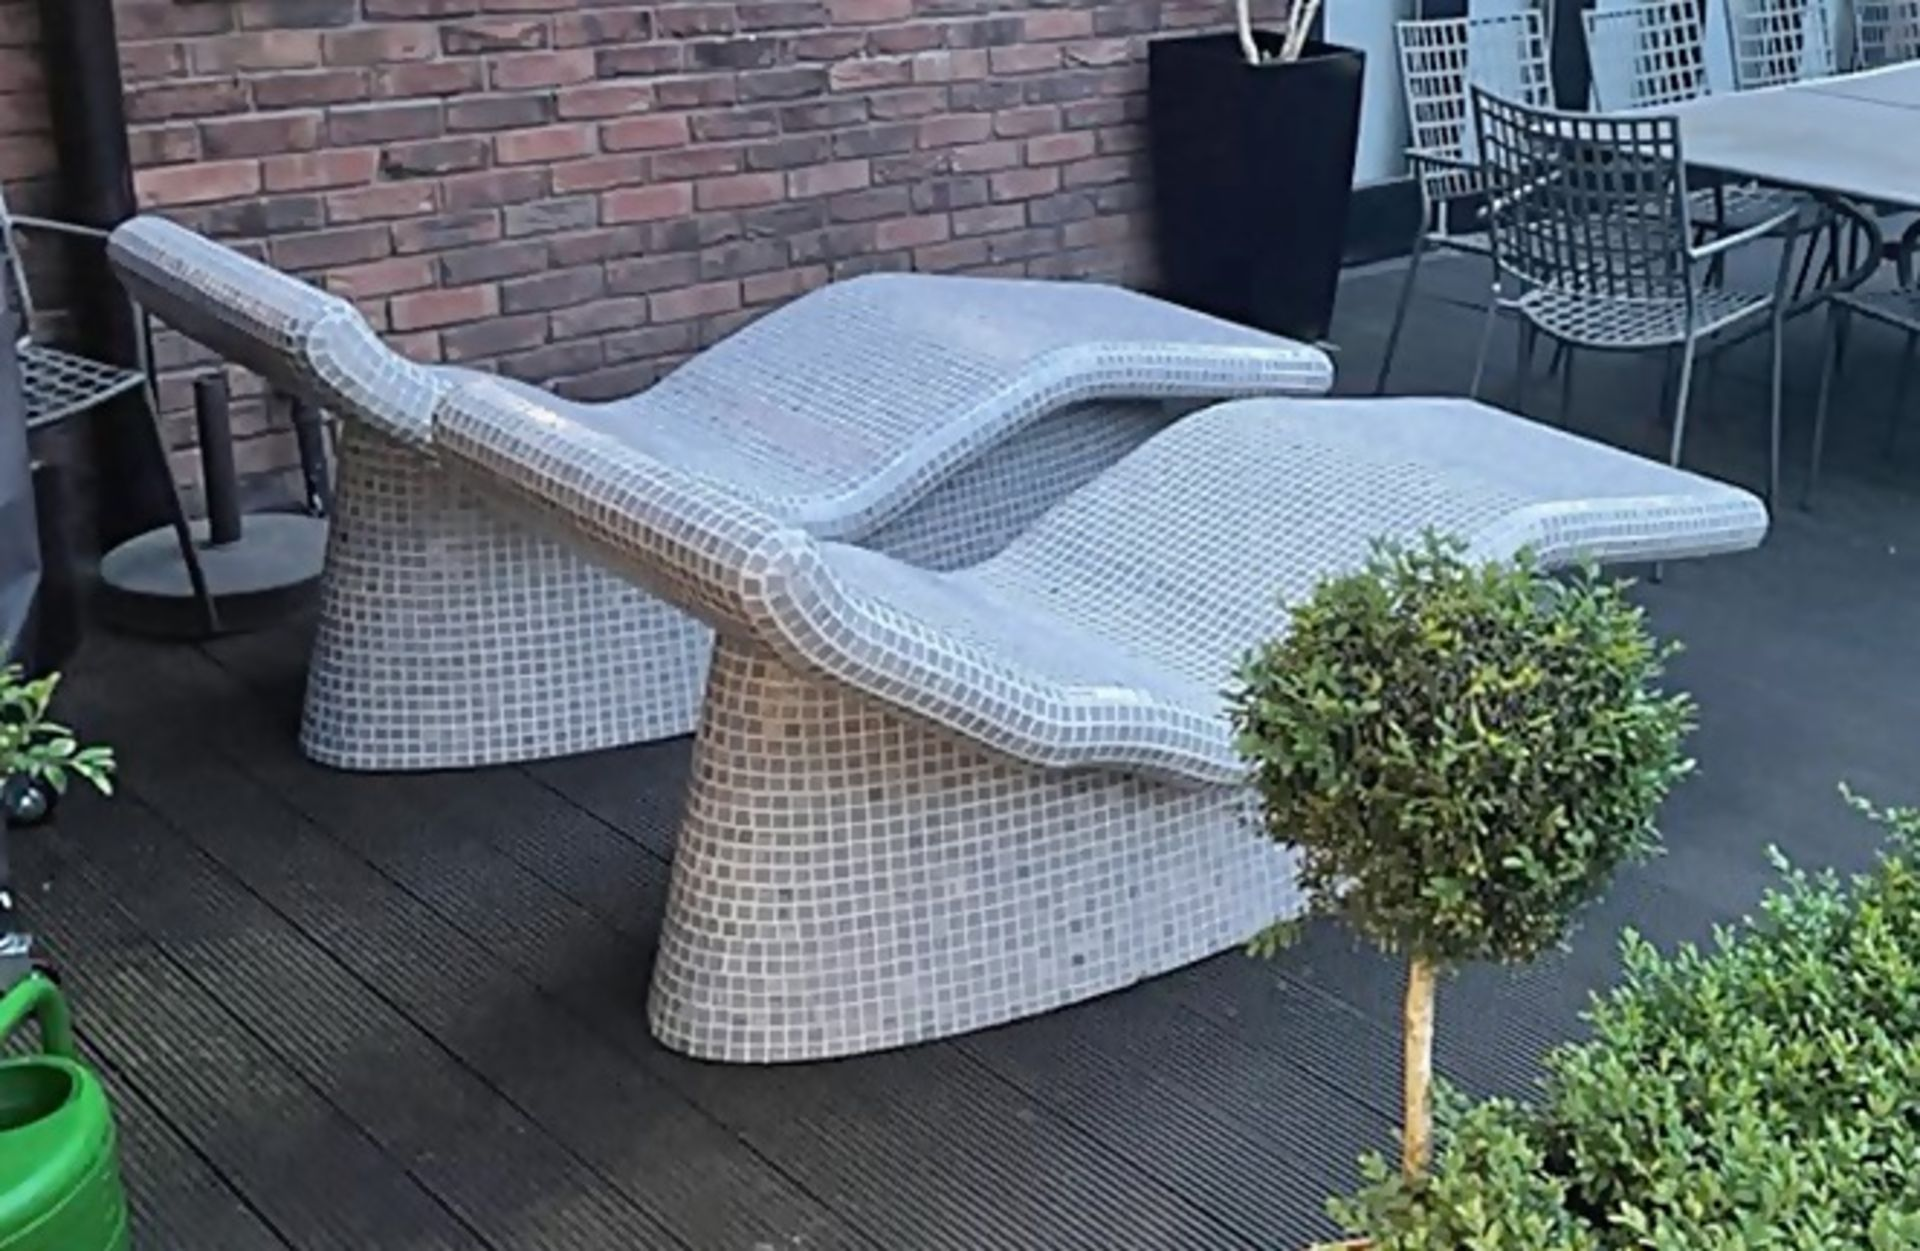 2 x Heated Sun Lounge Chairs - Brand New / Unused - Original Price £8,000 - CL636 - Location: - Image 2 of 2